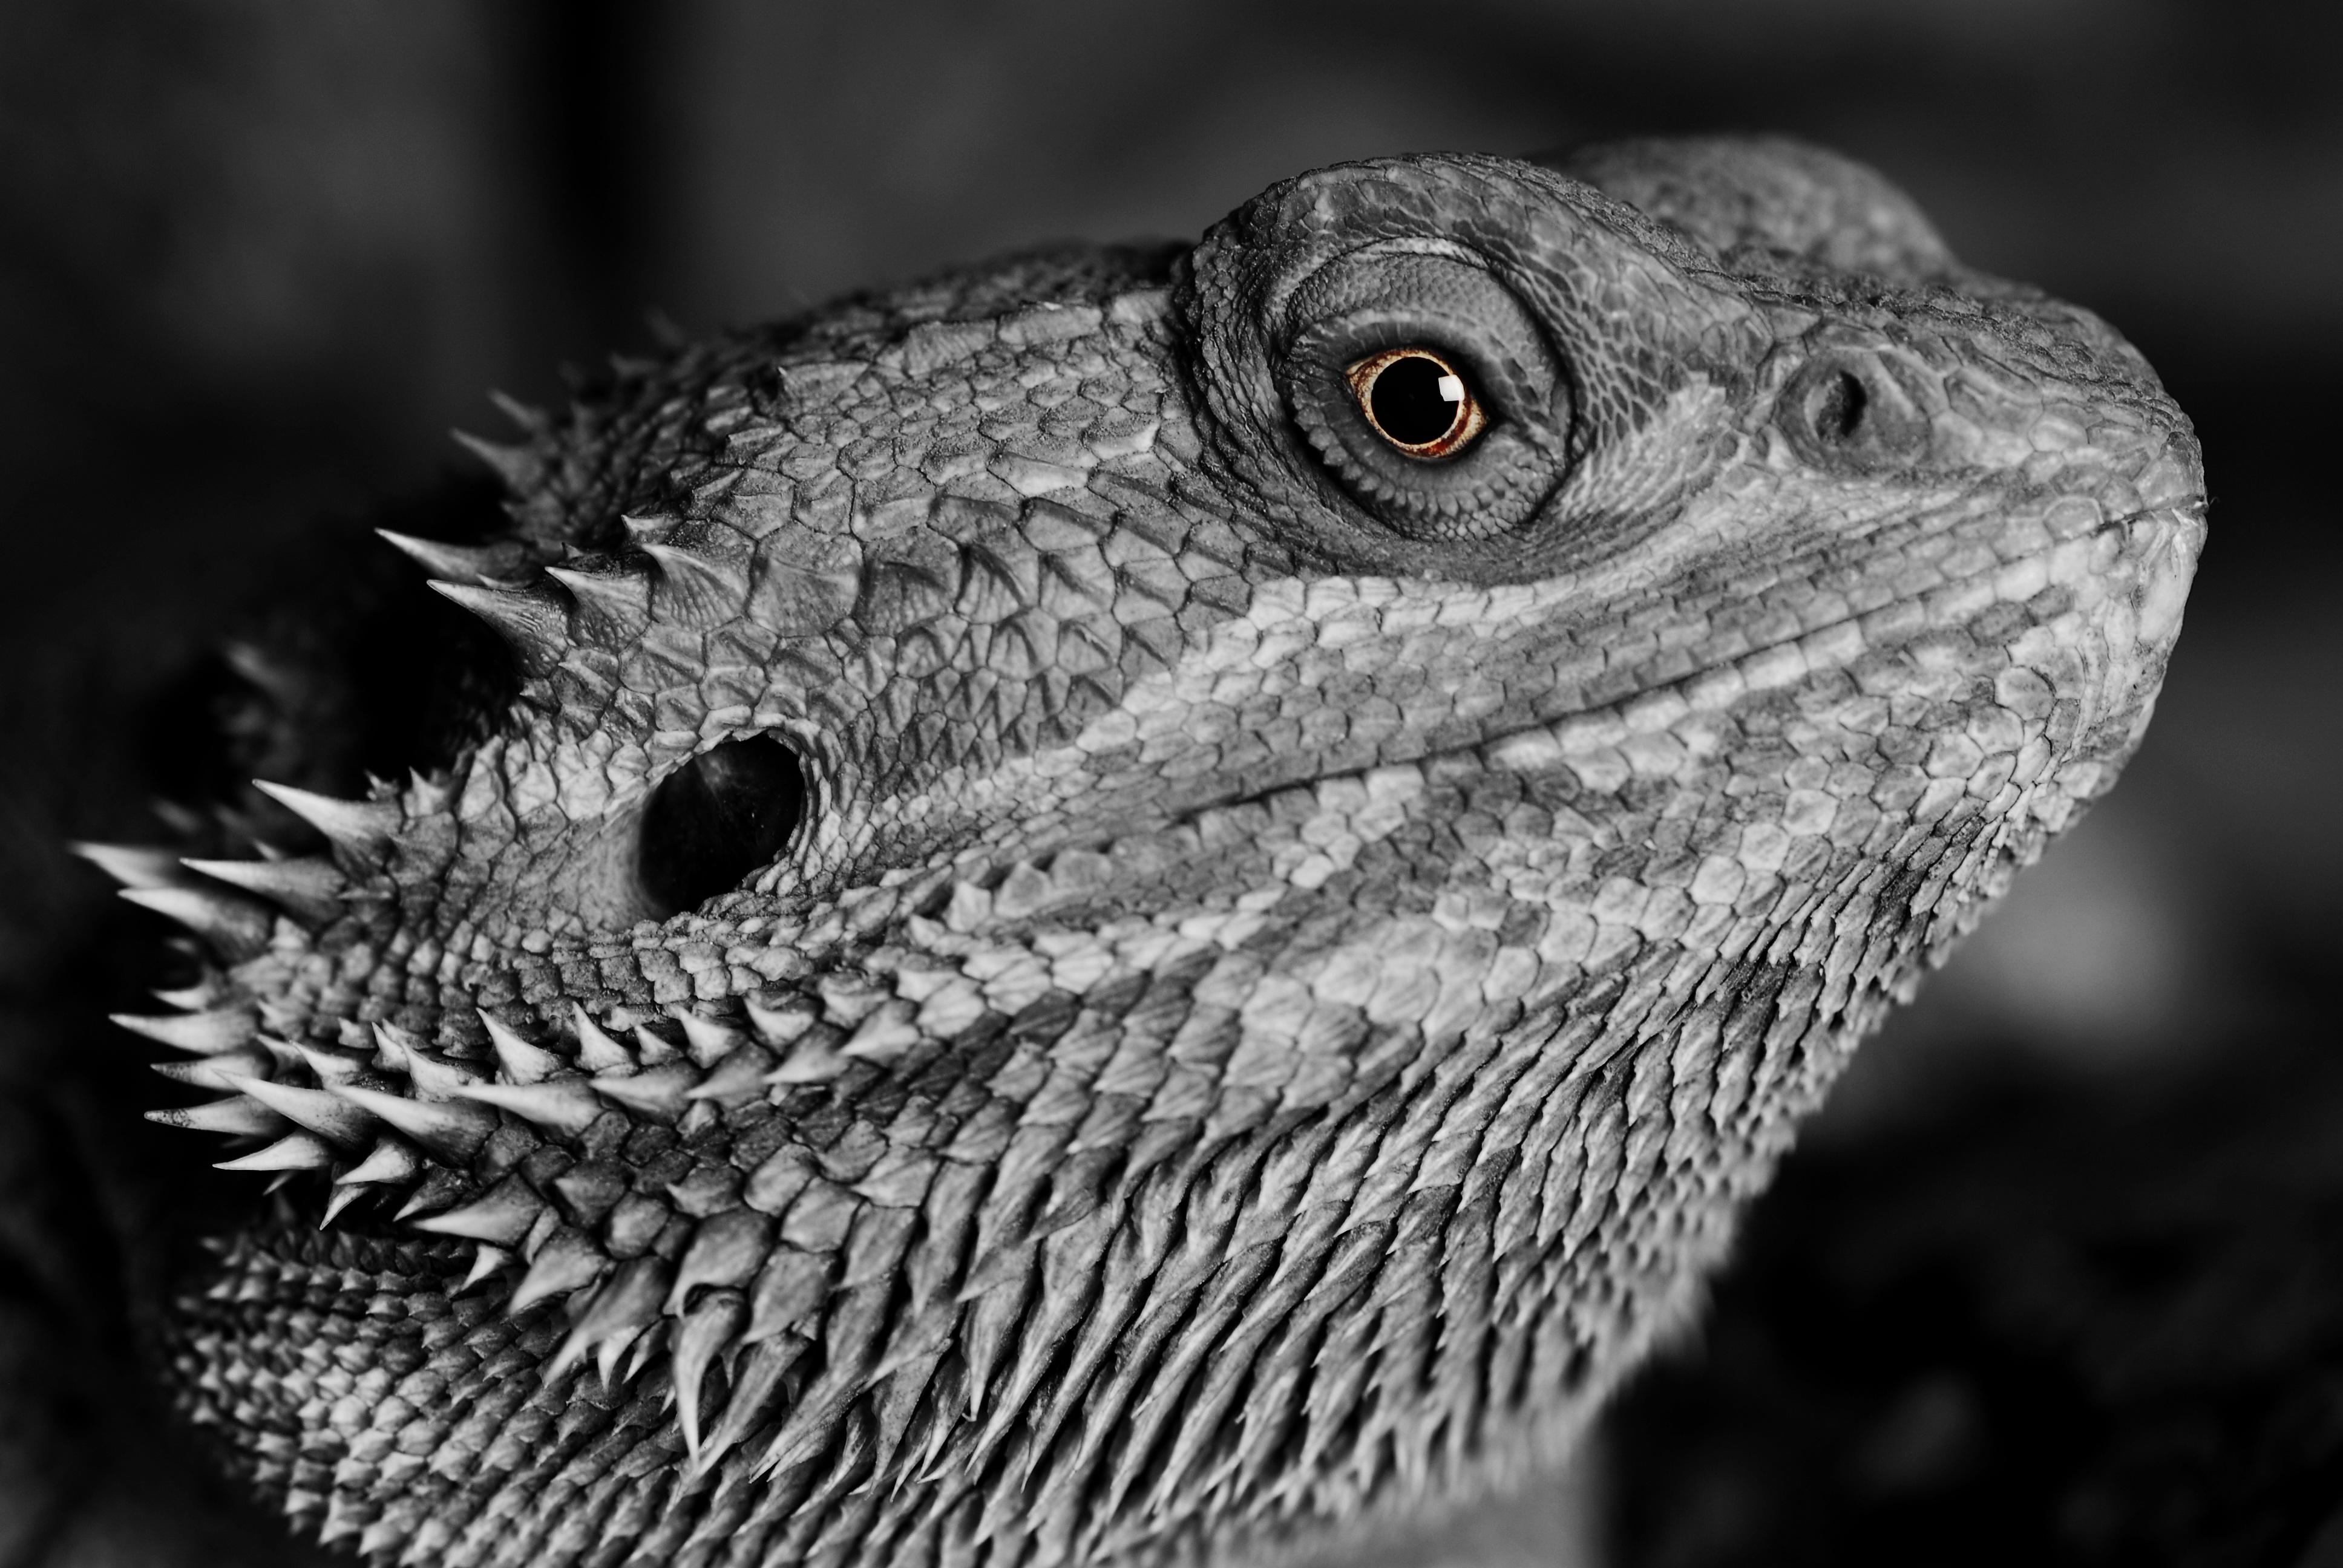 320x240 Lizard Reptile Monochrome 4k Apple Iphone Ipod Touch